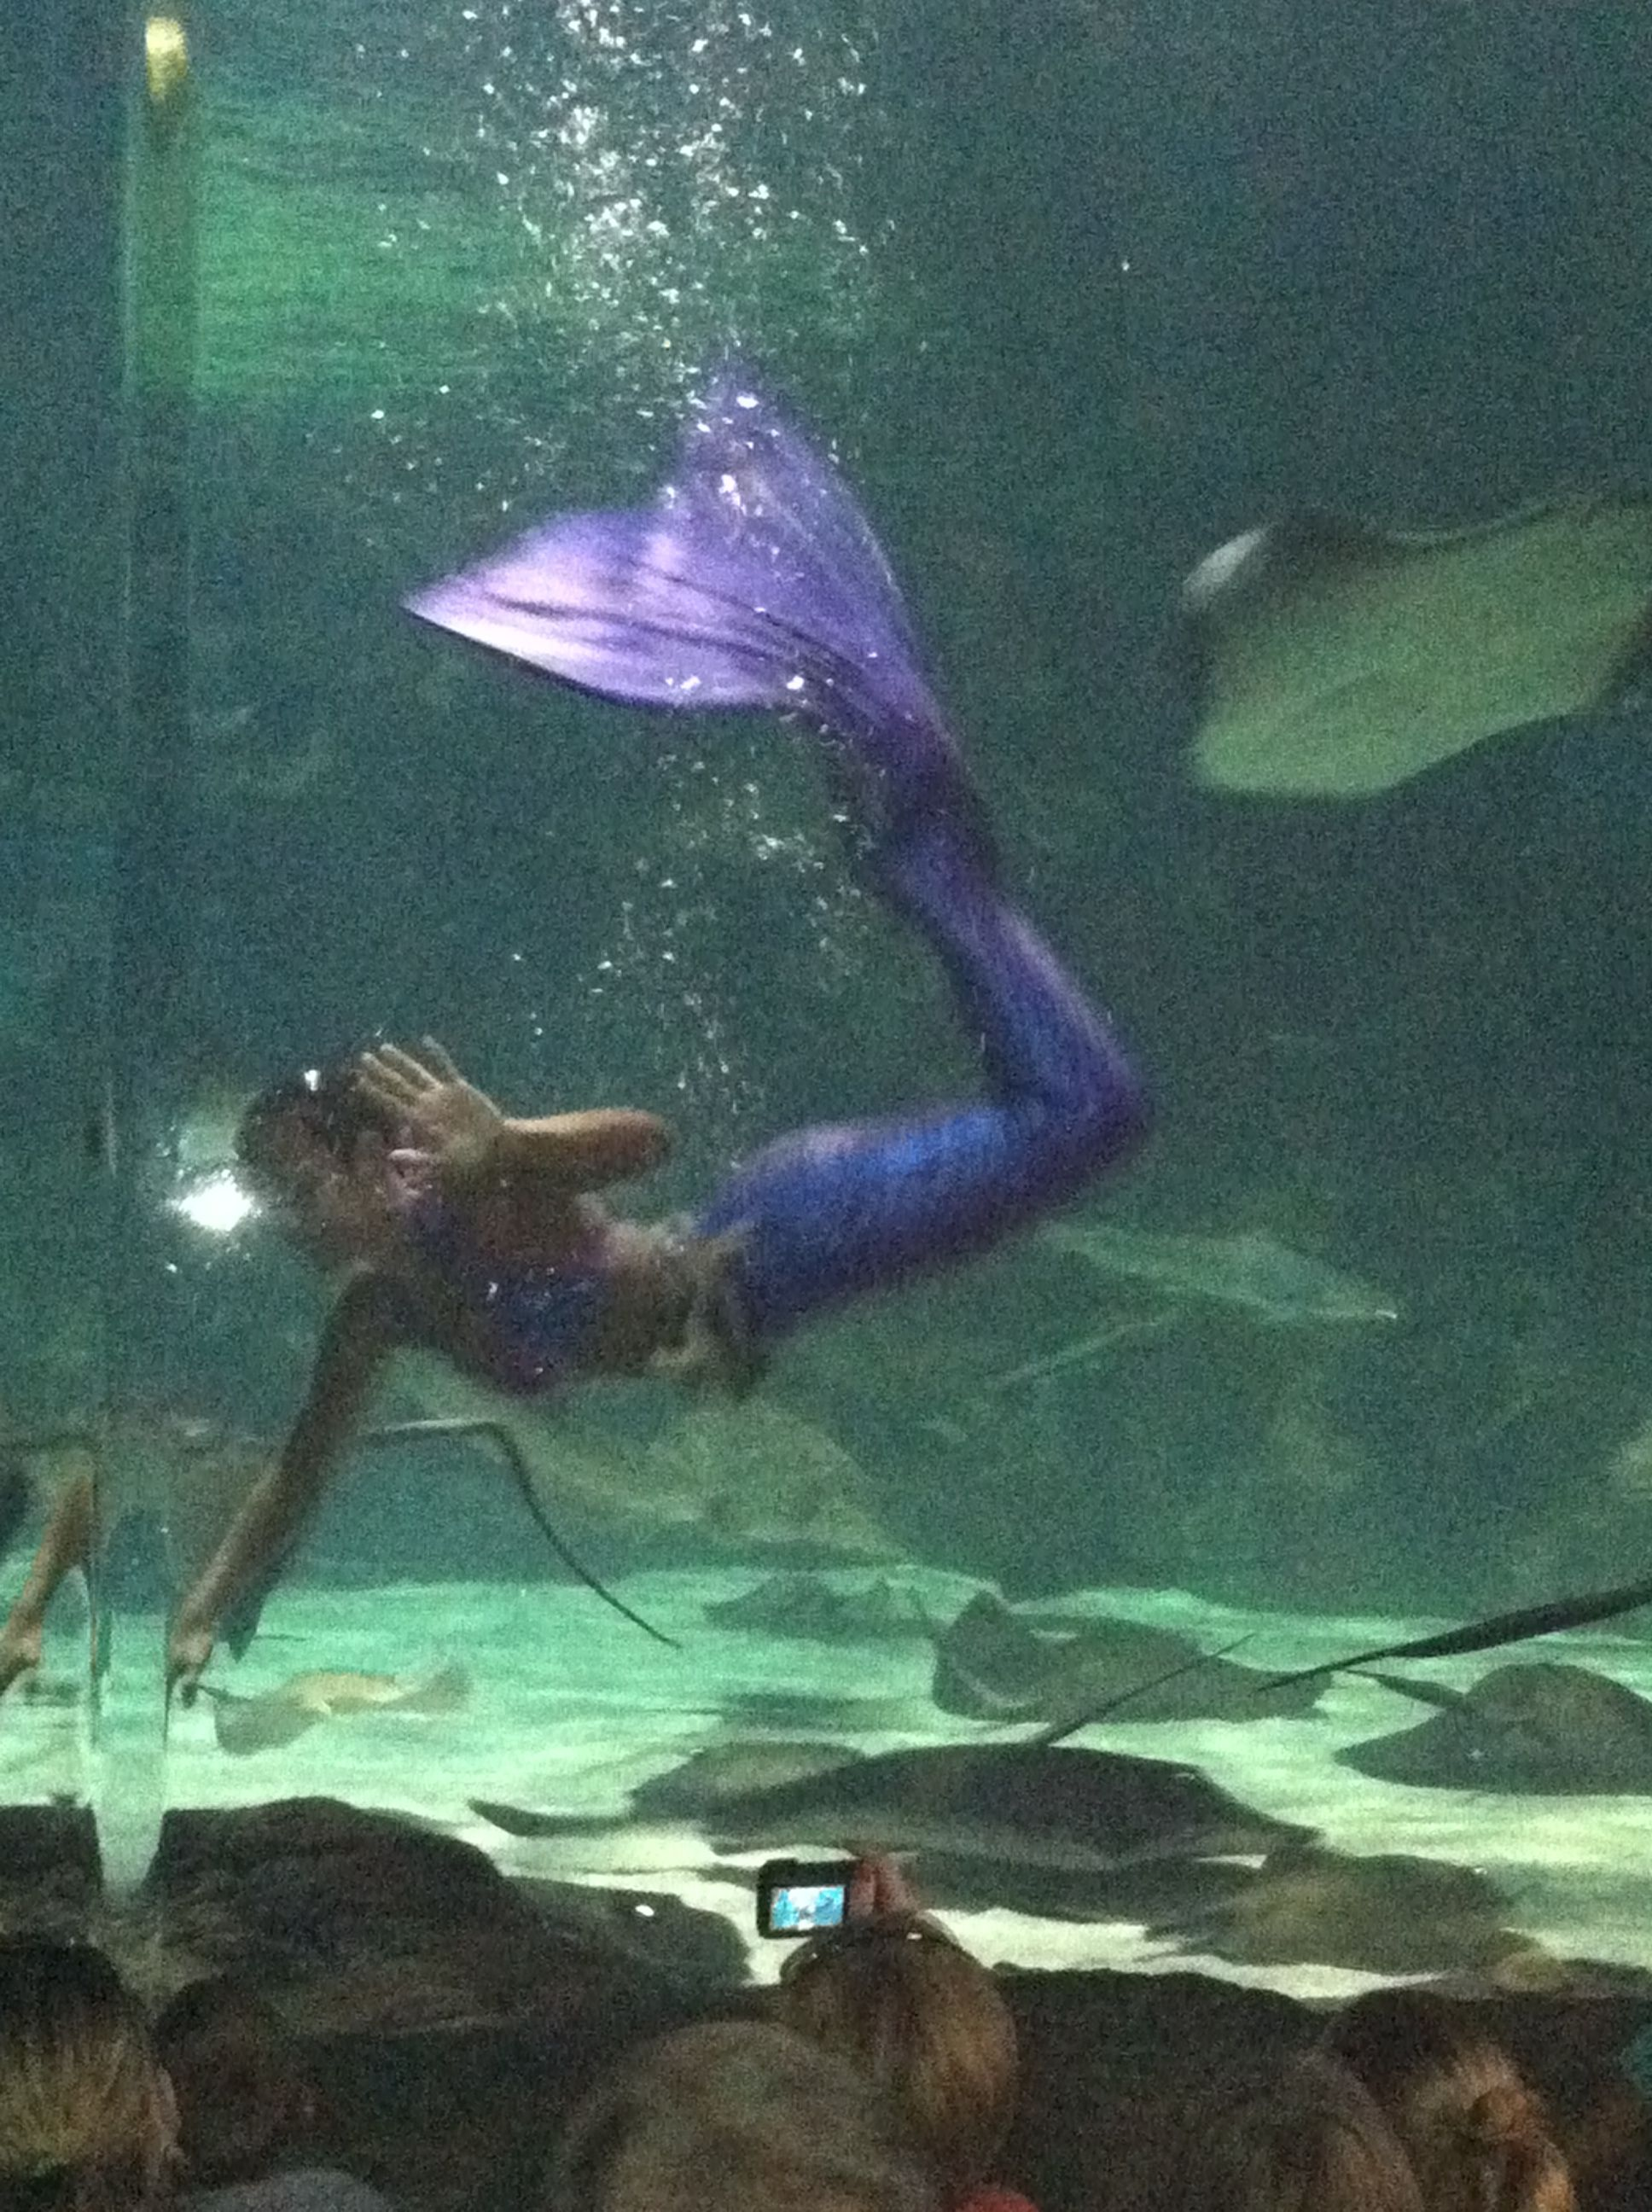 Ripleys Aquarium At Myrtle Beach Sc Mermaid Show